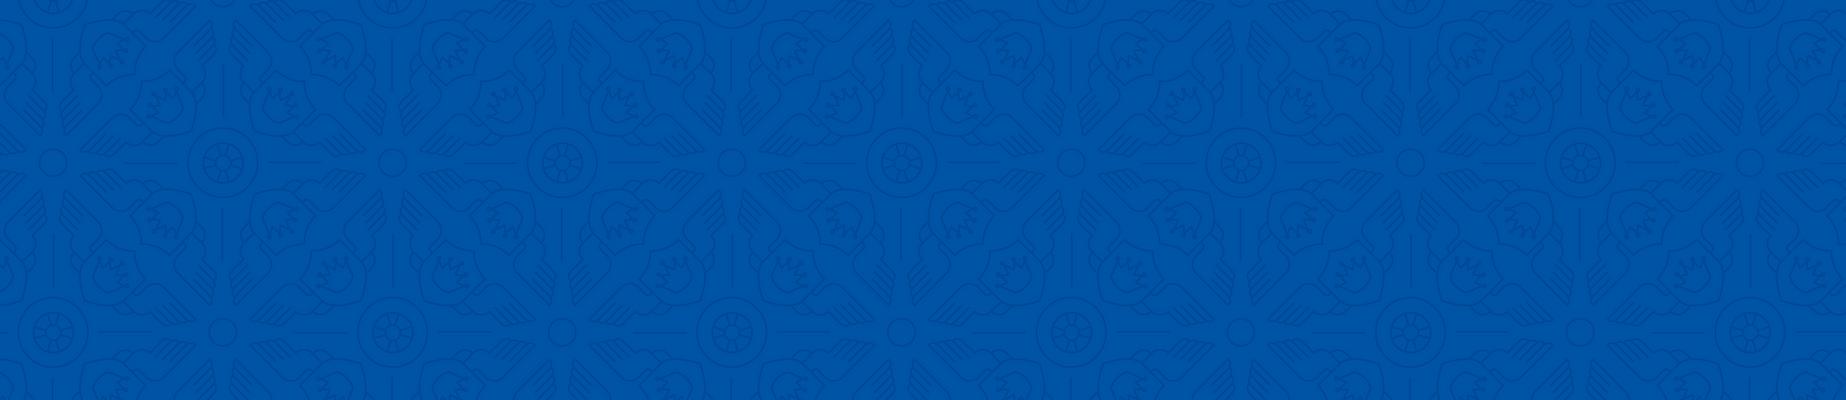 KV_Homepage_Pattern-09.png